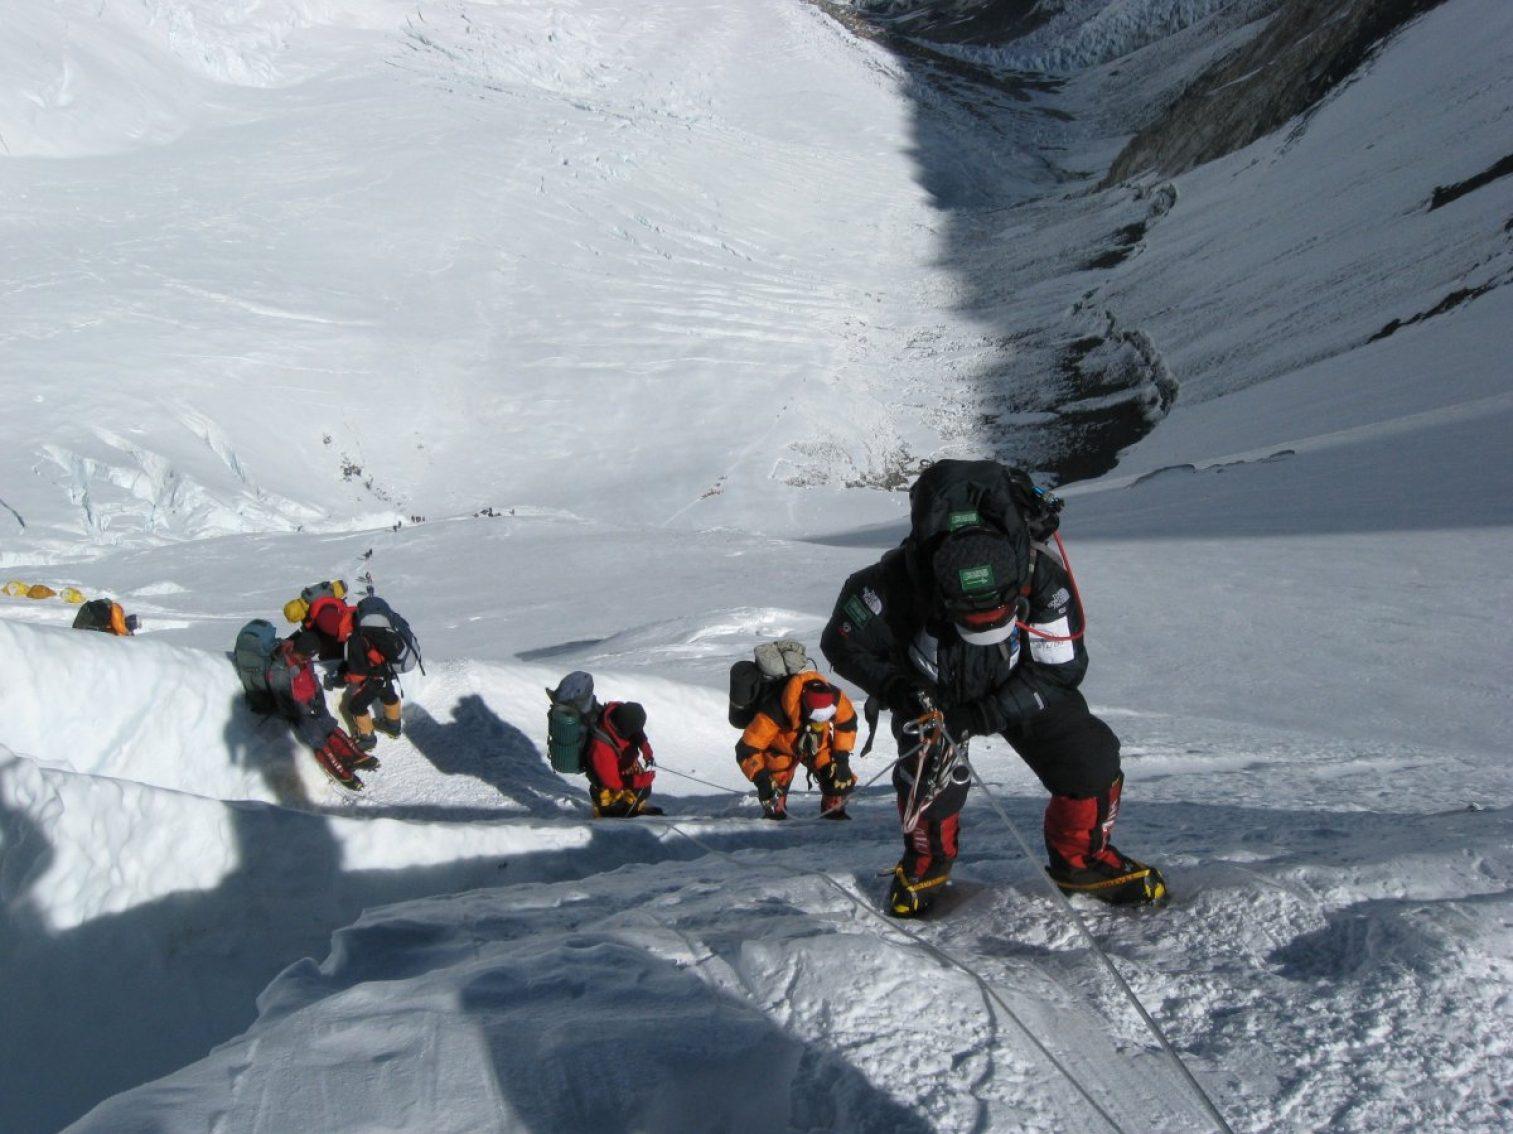 mount everest, mountains, winter